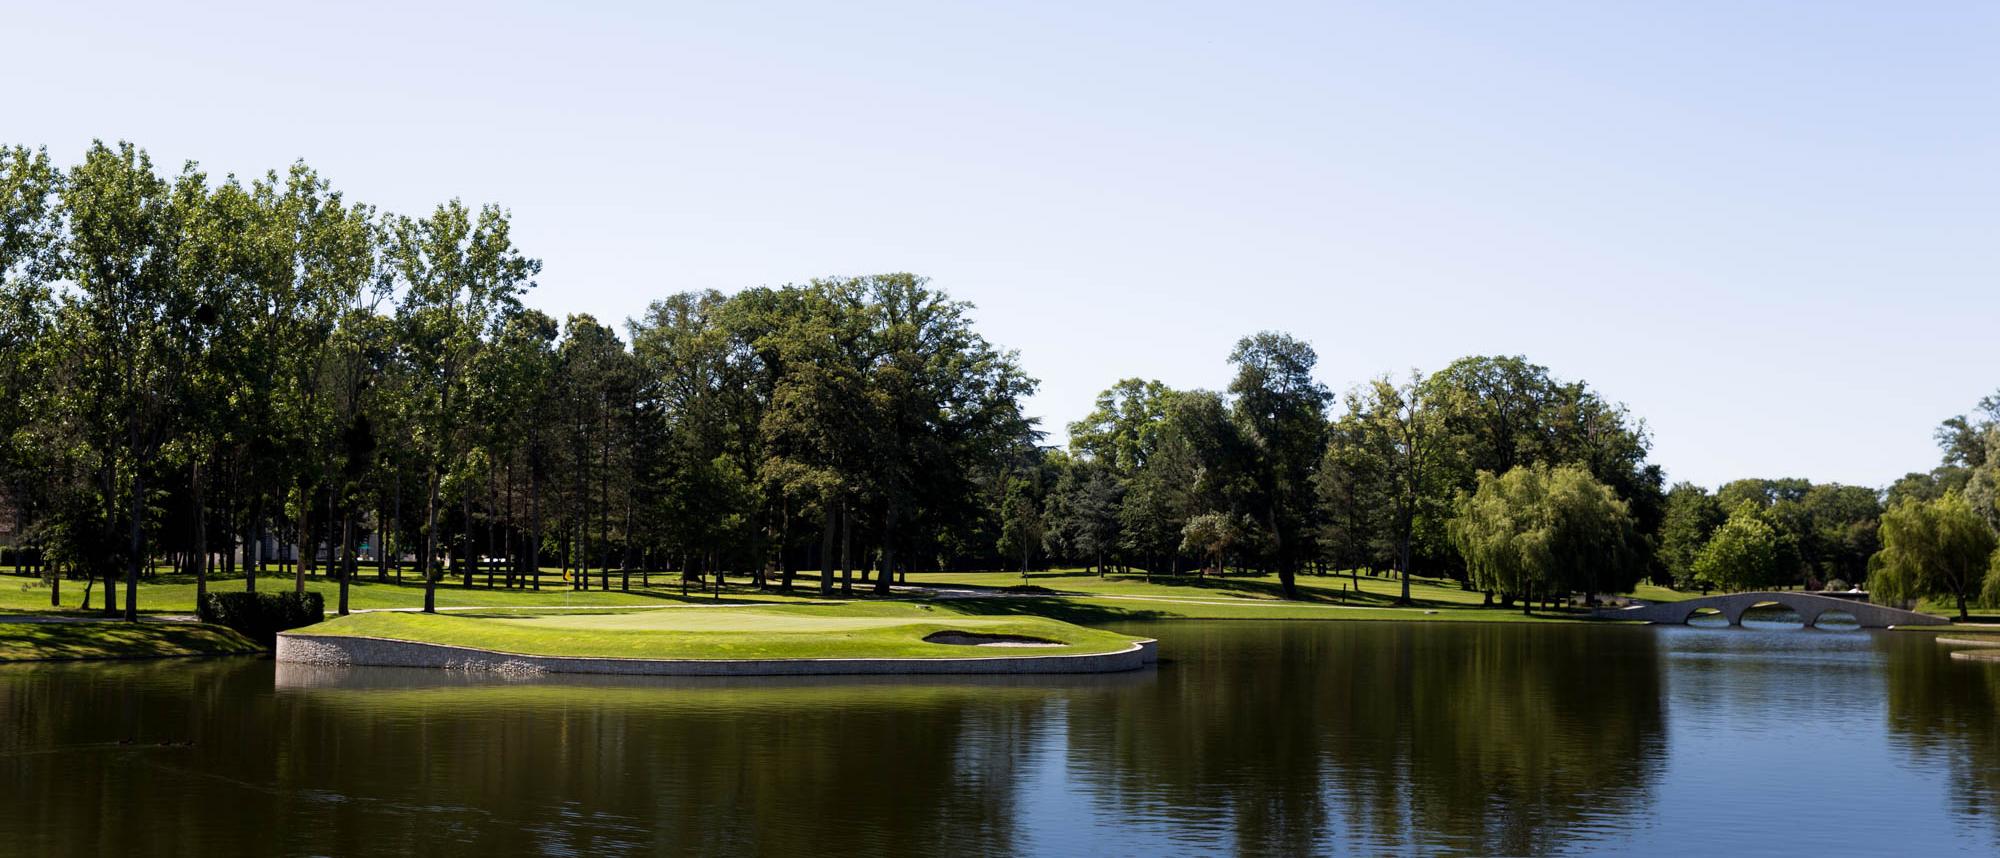 Island golf green